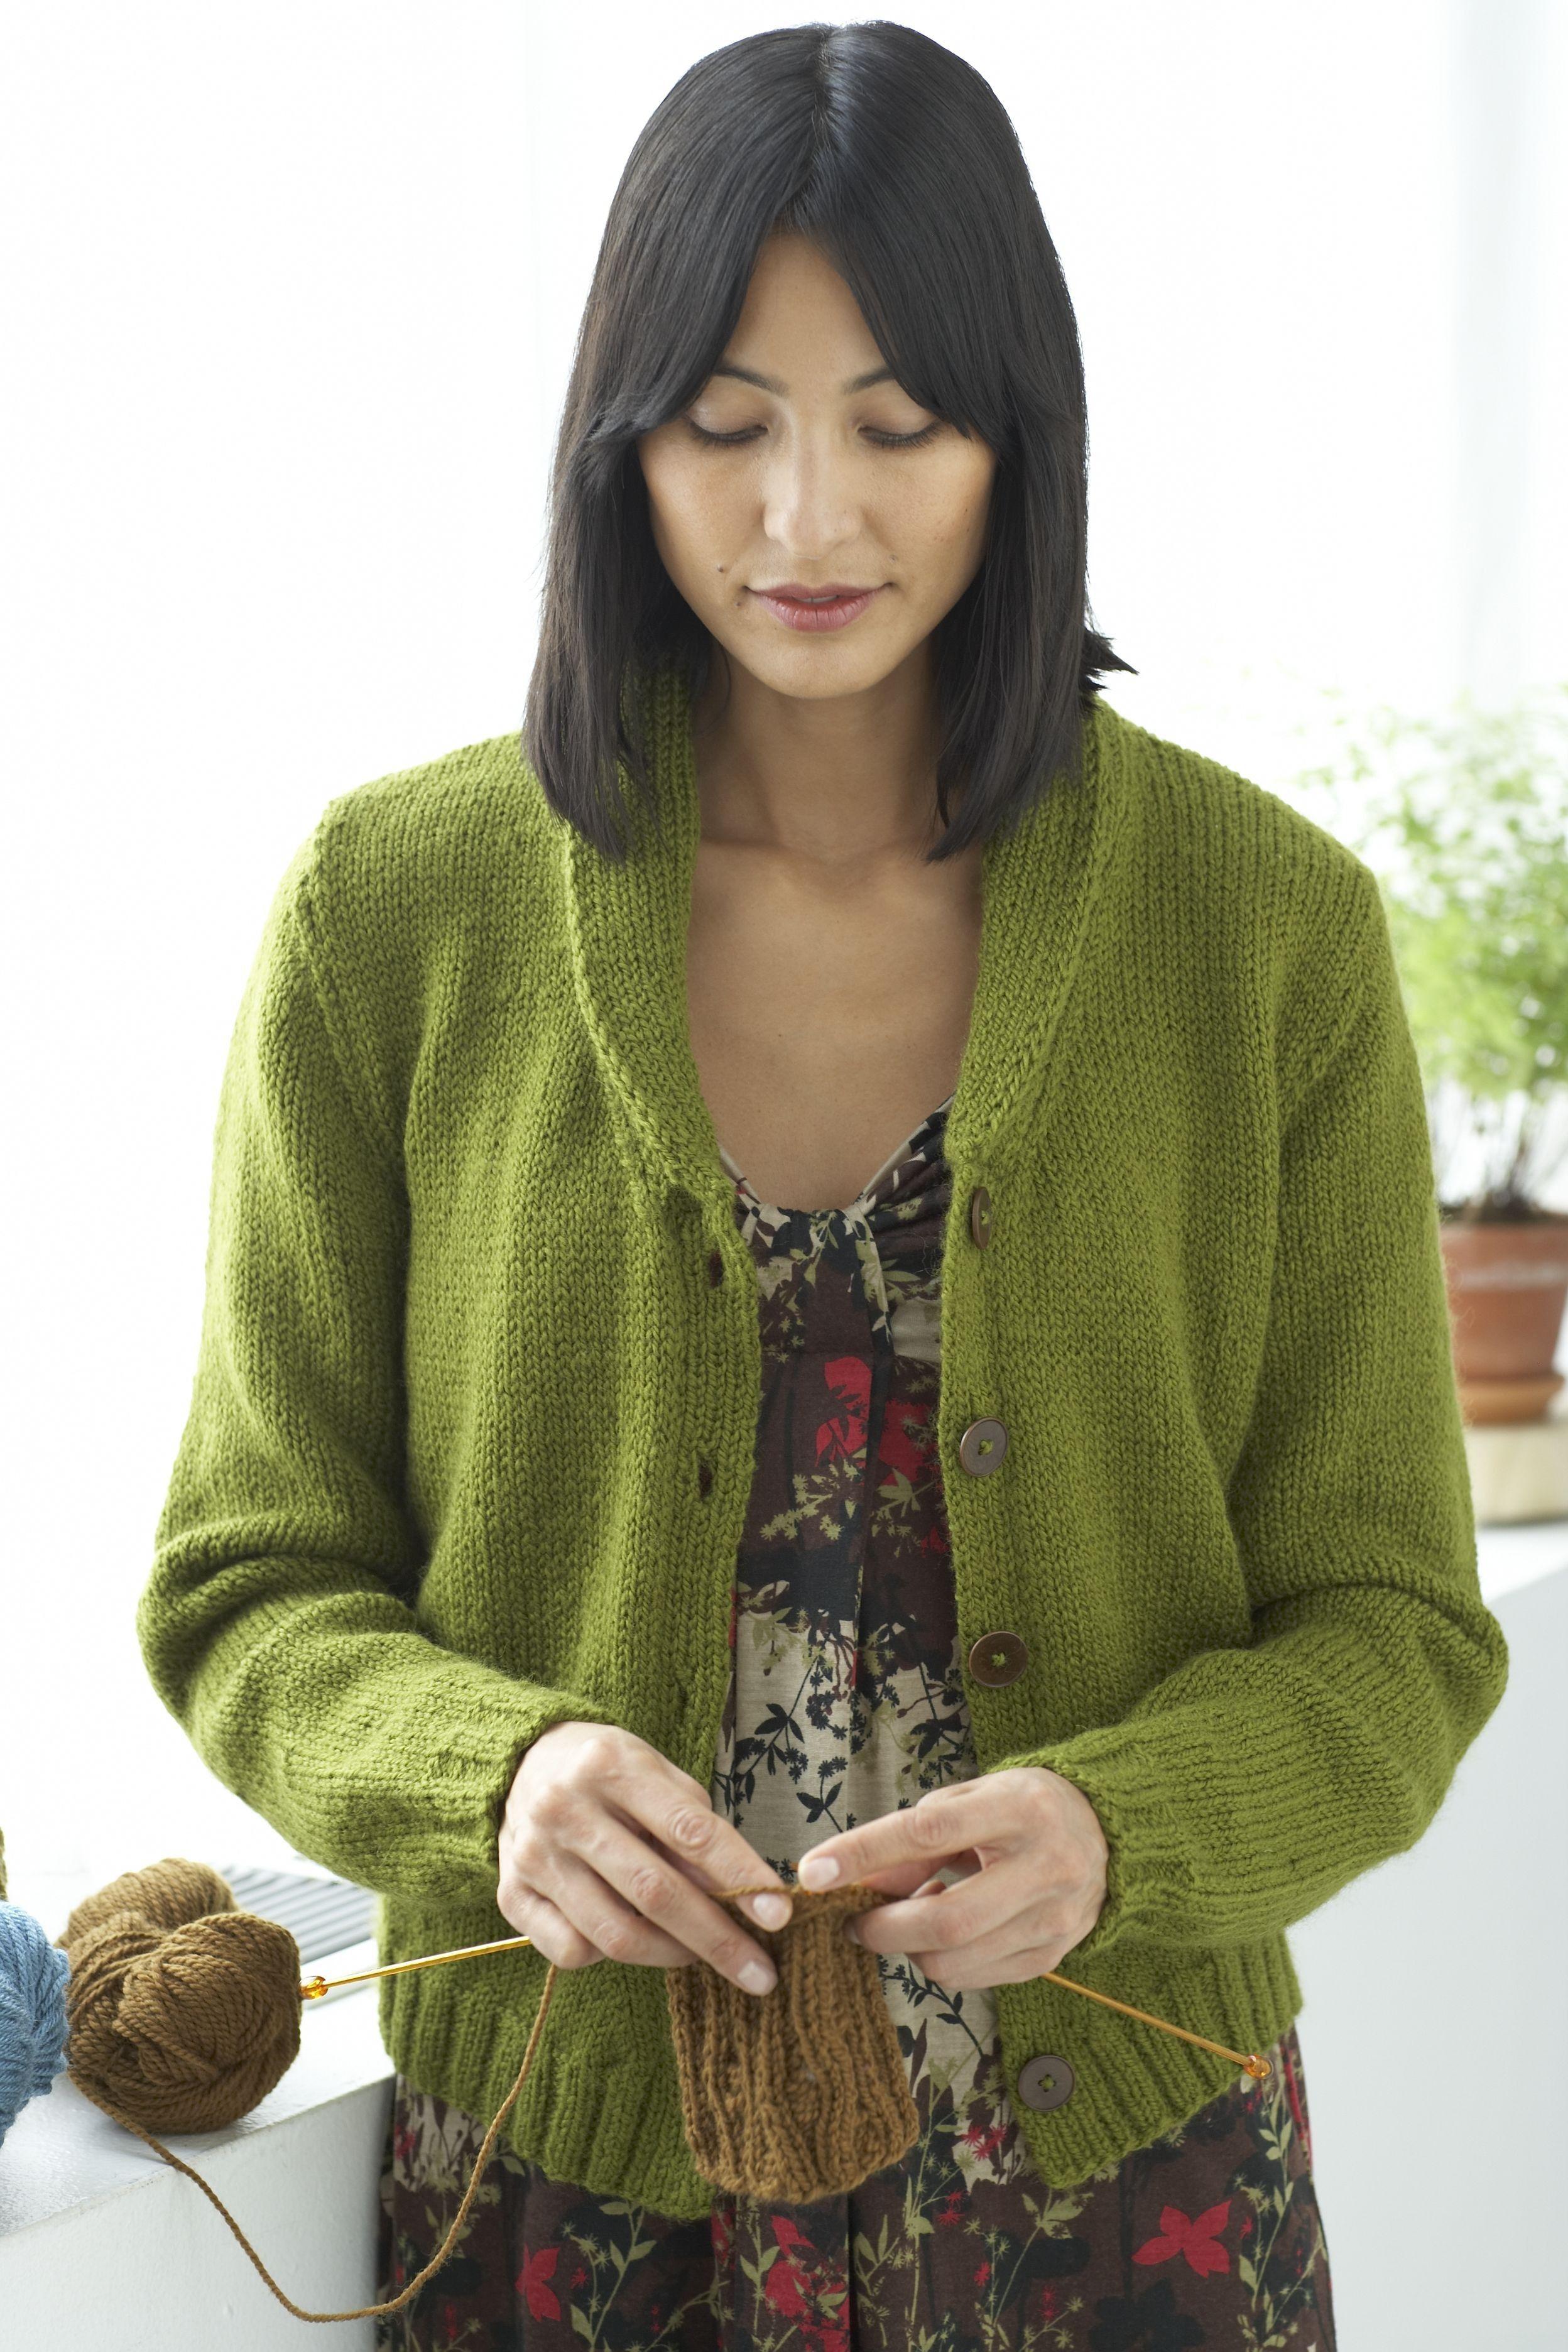 Portland Cardigan Pattern (Knit) Free Download from Lion Brand Yarns ...